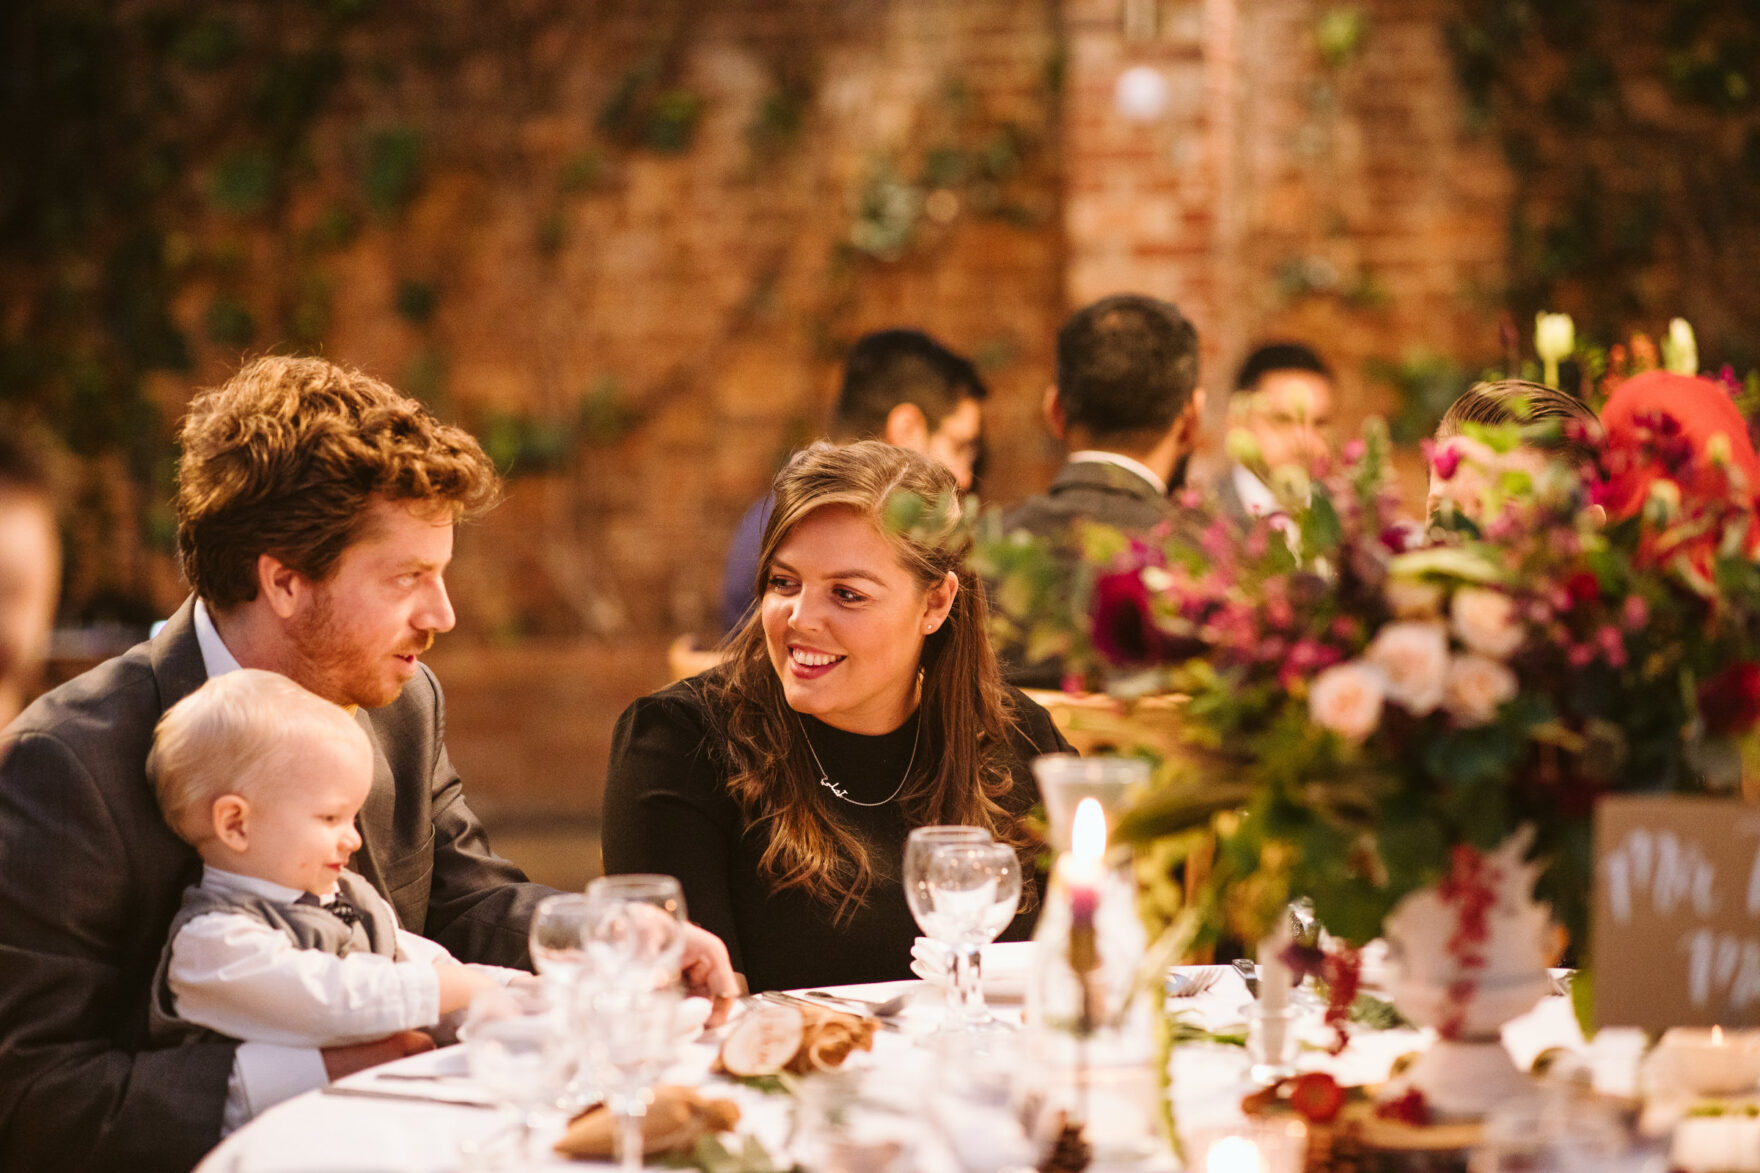 guests at a wedding reception